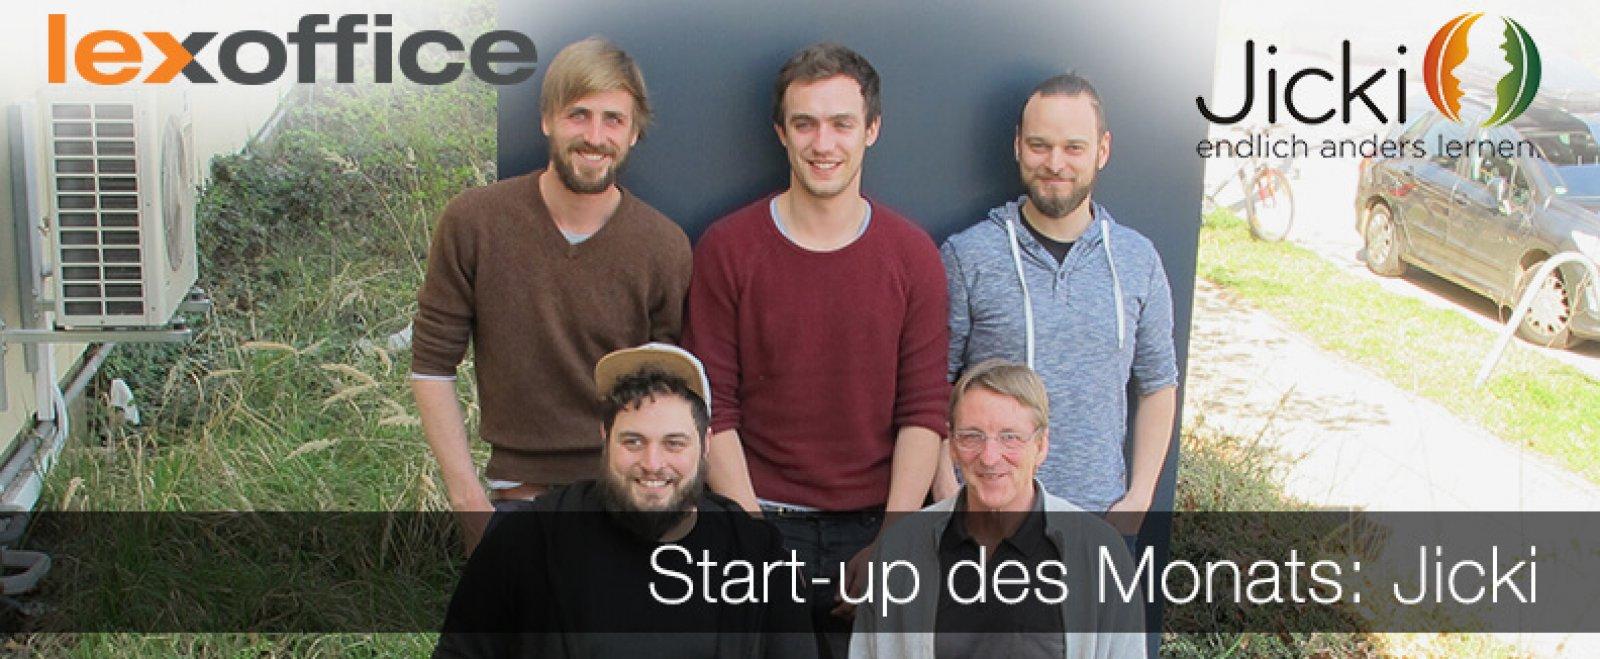 lexoffice stellt Euch das Start-up des Monats Mai 2017 vor: Jicki